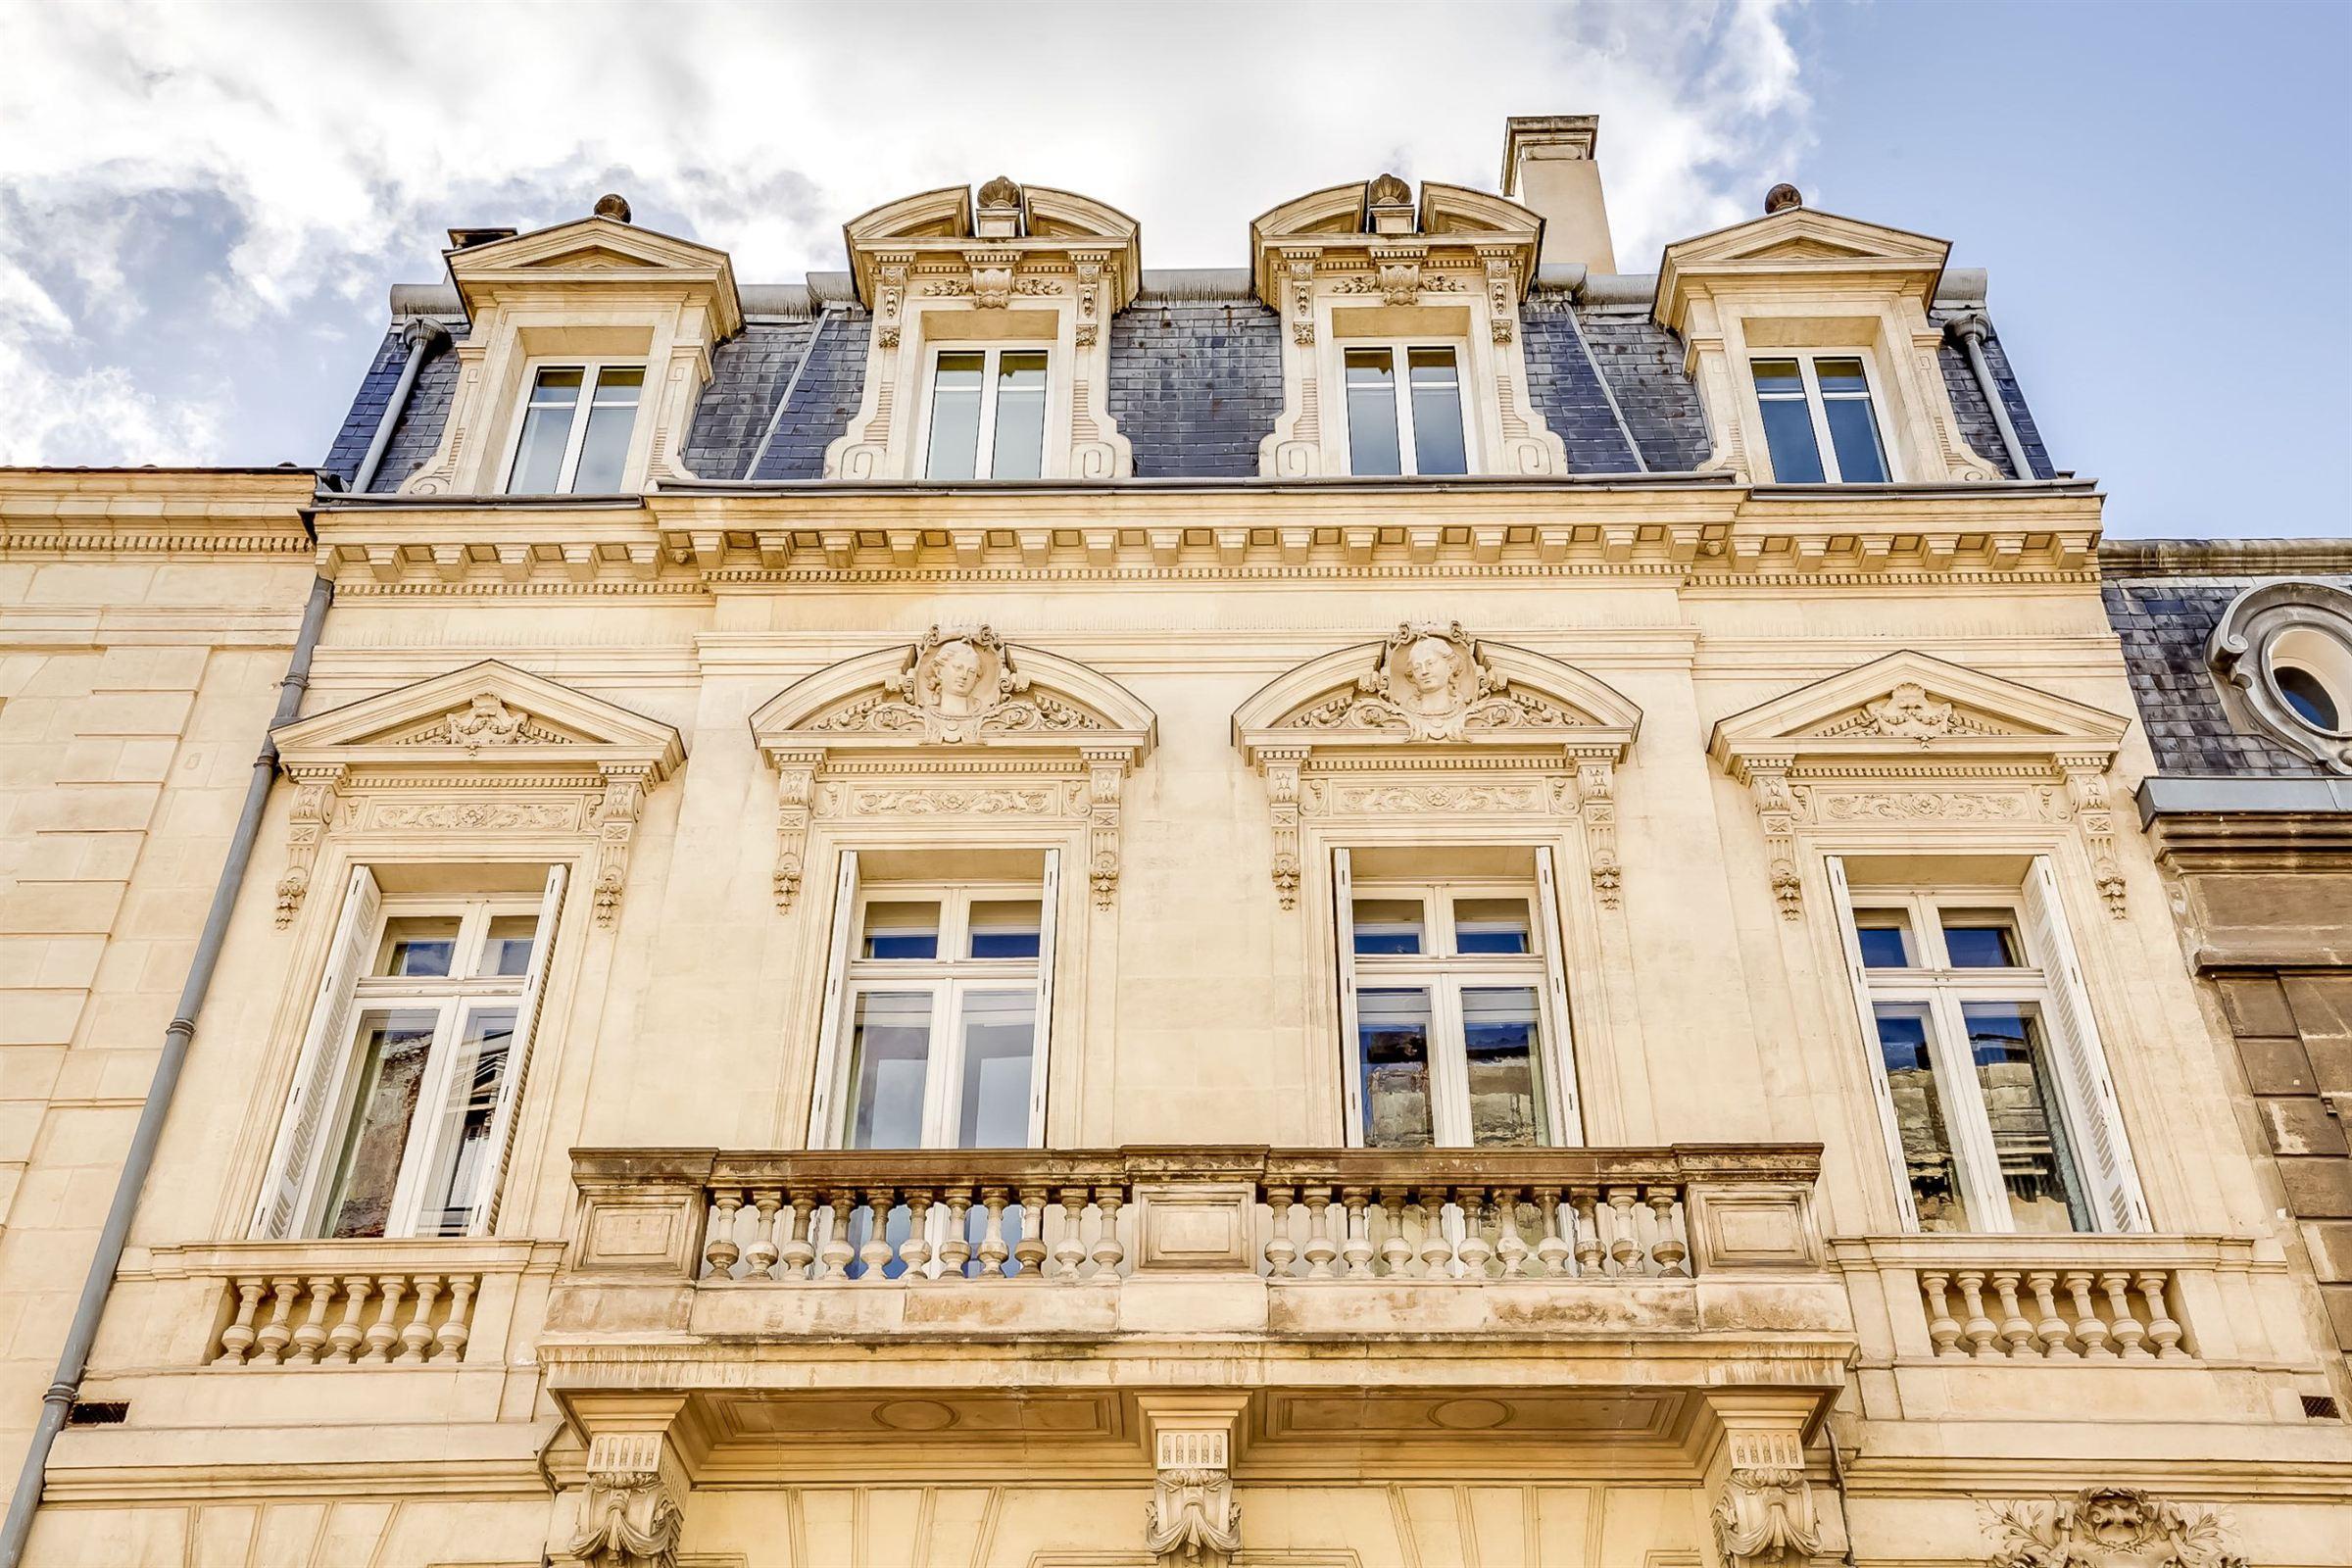 Casa Unifamiliar por un Venta en BORDEAUX SUPERBE LUXURY TOWNHOUSE Bordeaux, Aquitania, 33000 Francia